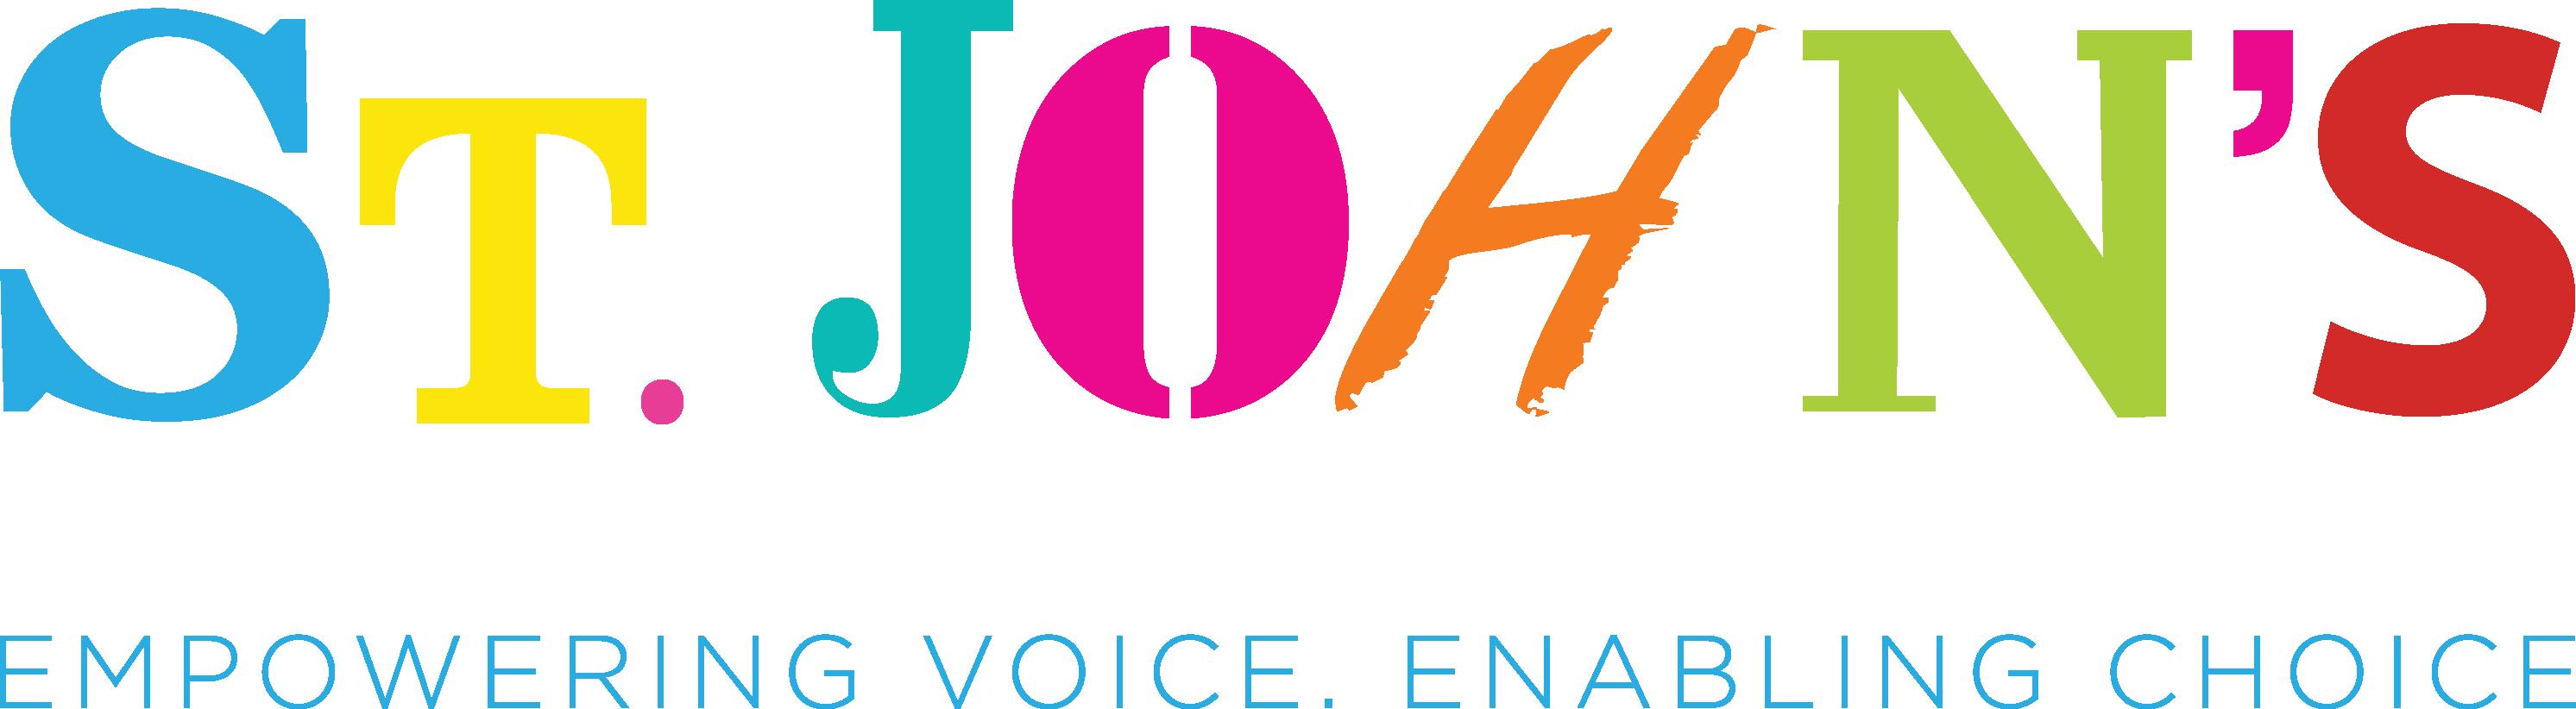 The logo of St John's School & College